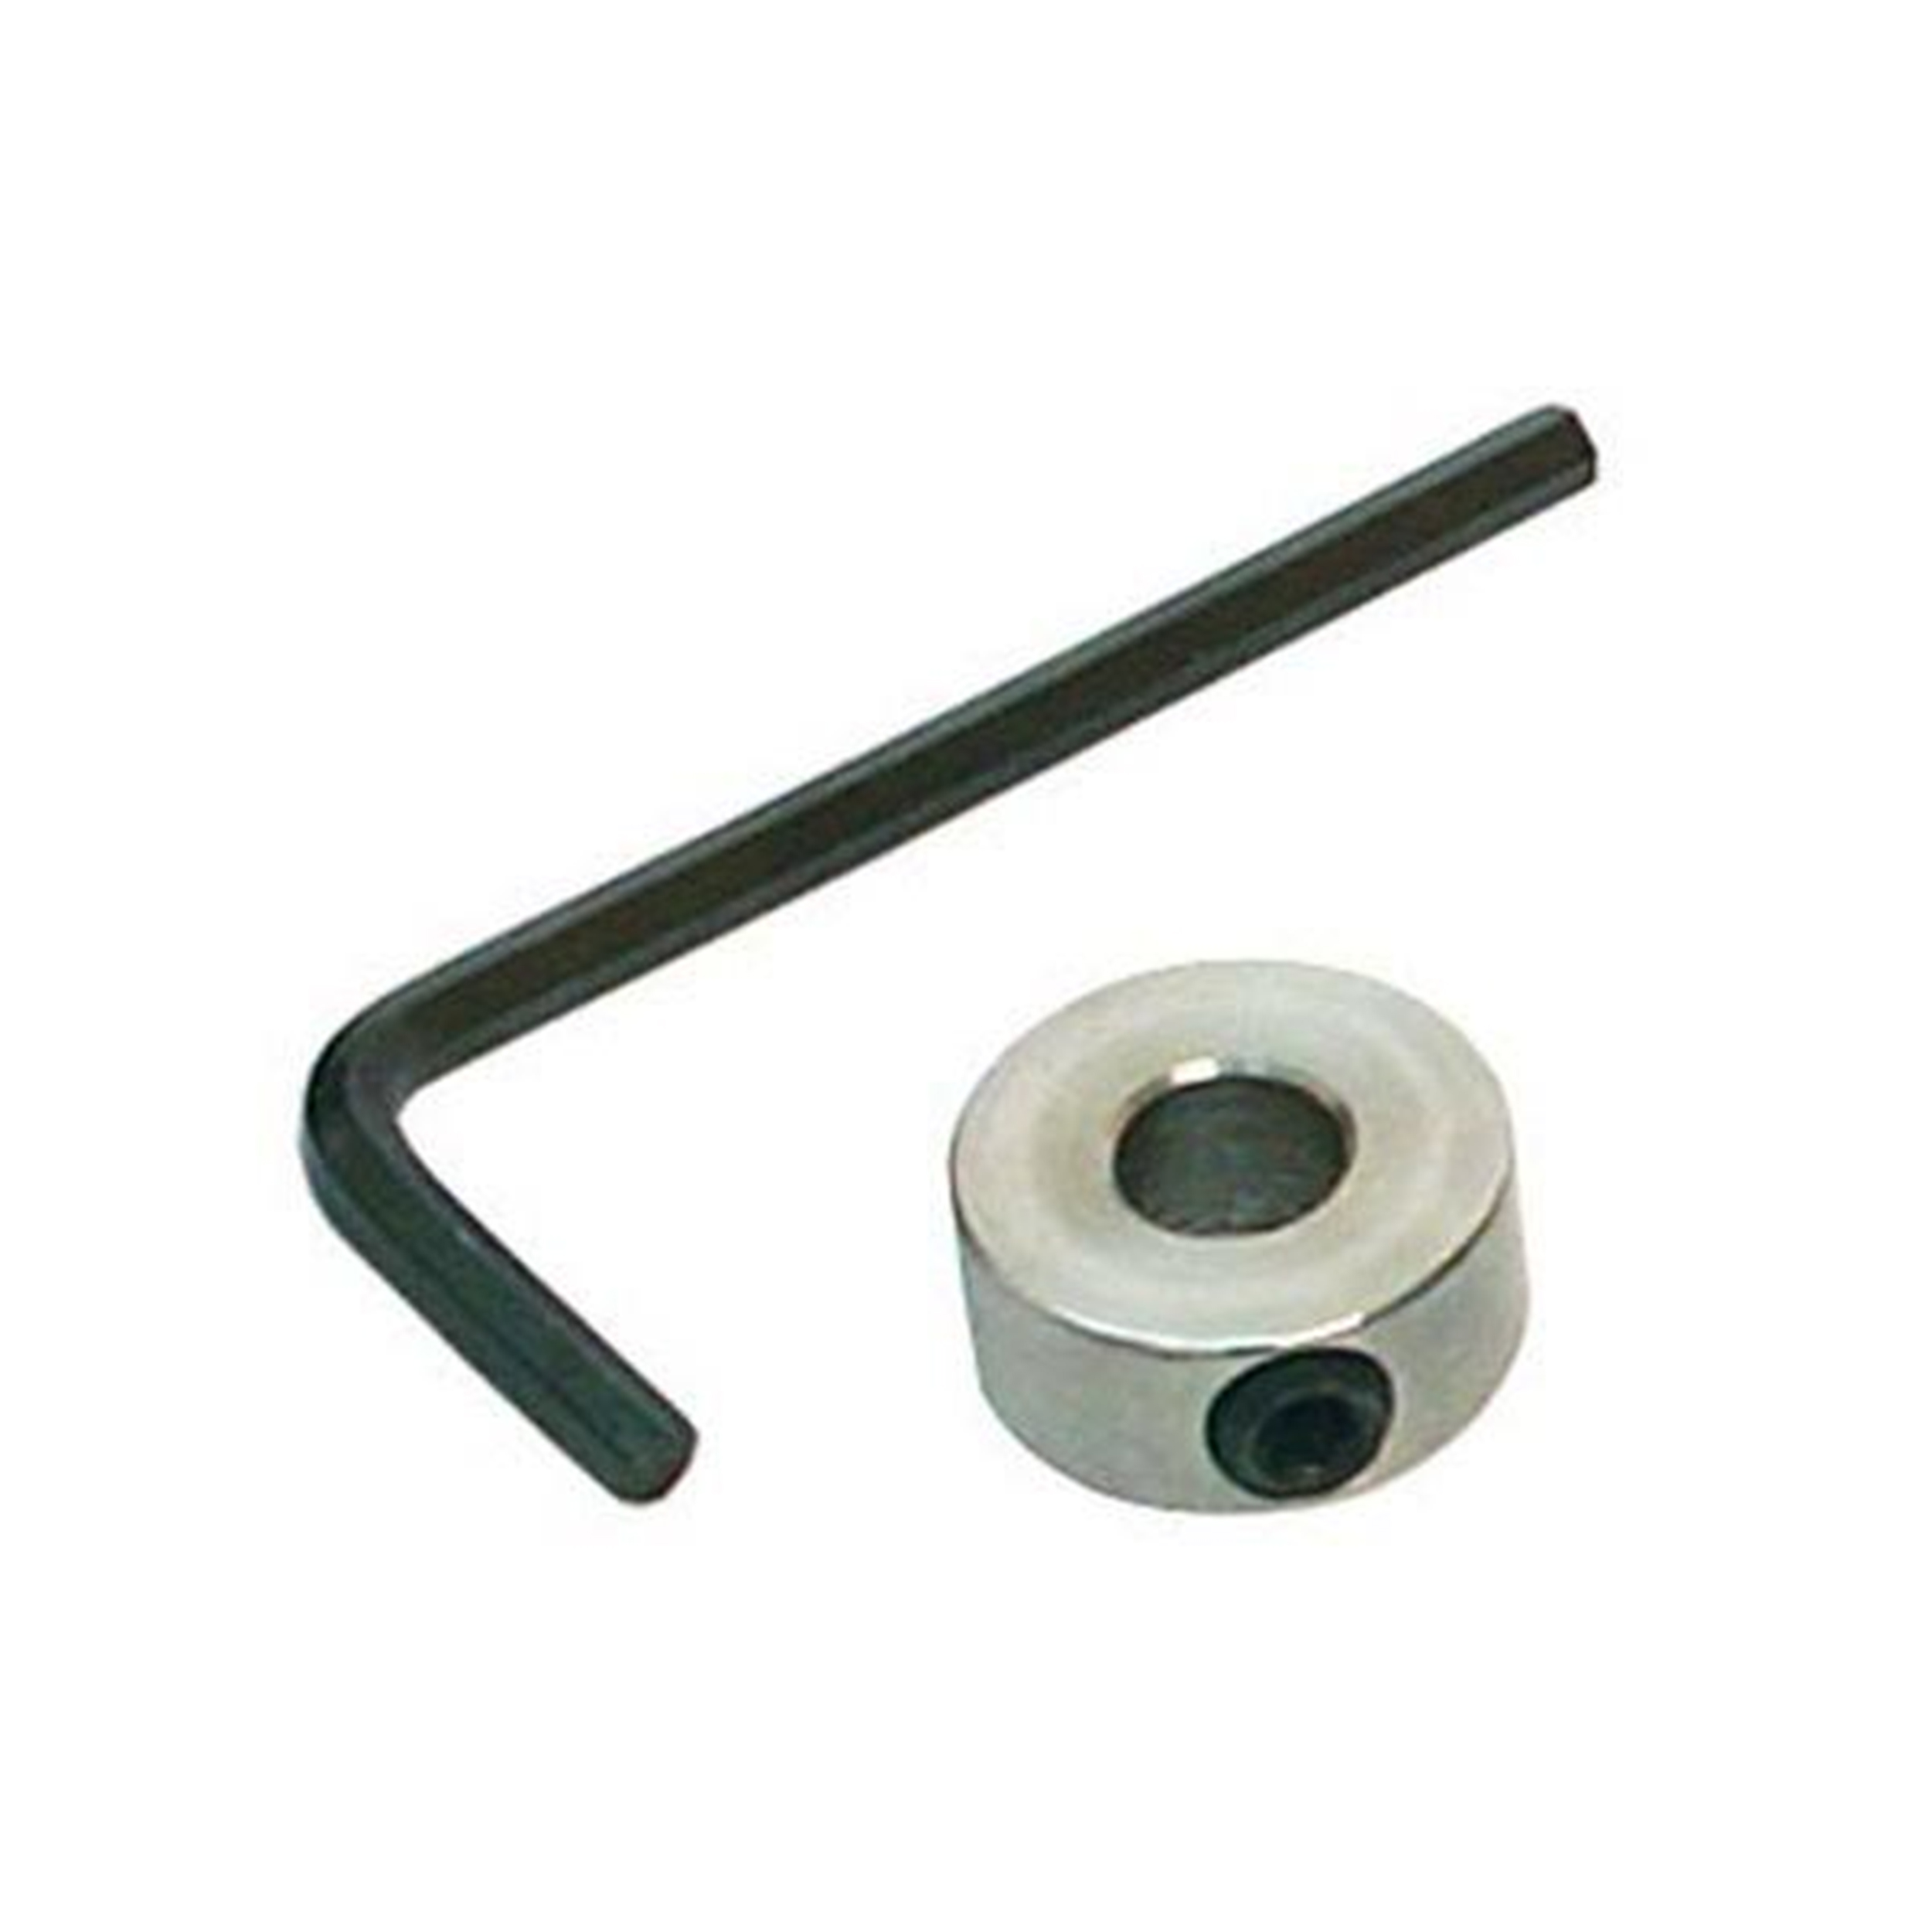 Kreg Micro Pocket Drill Bit Depth Collar With Hex Key